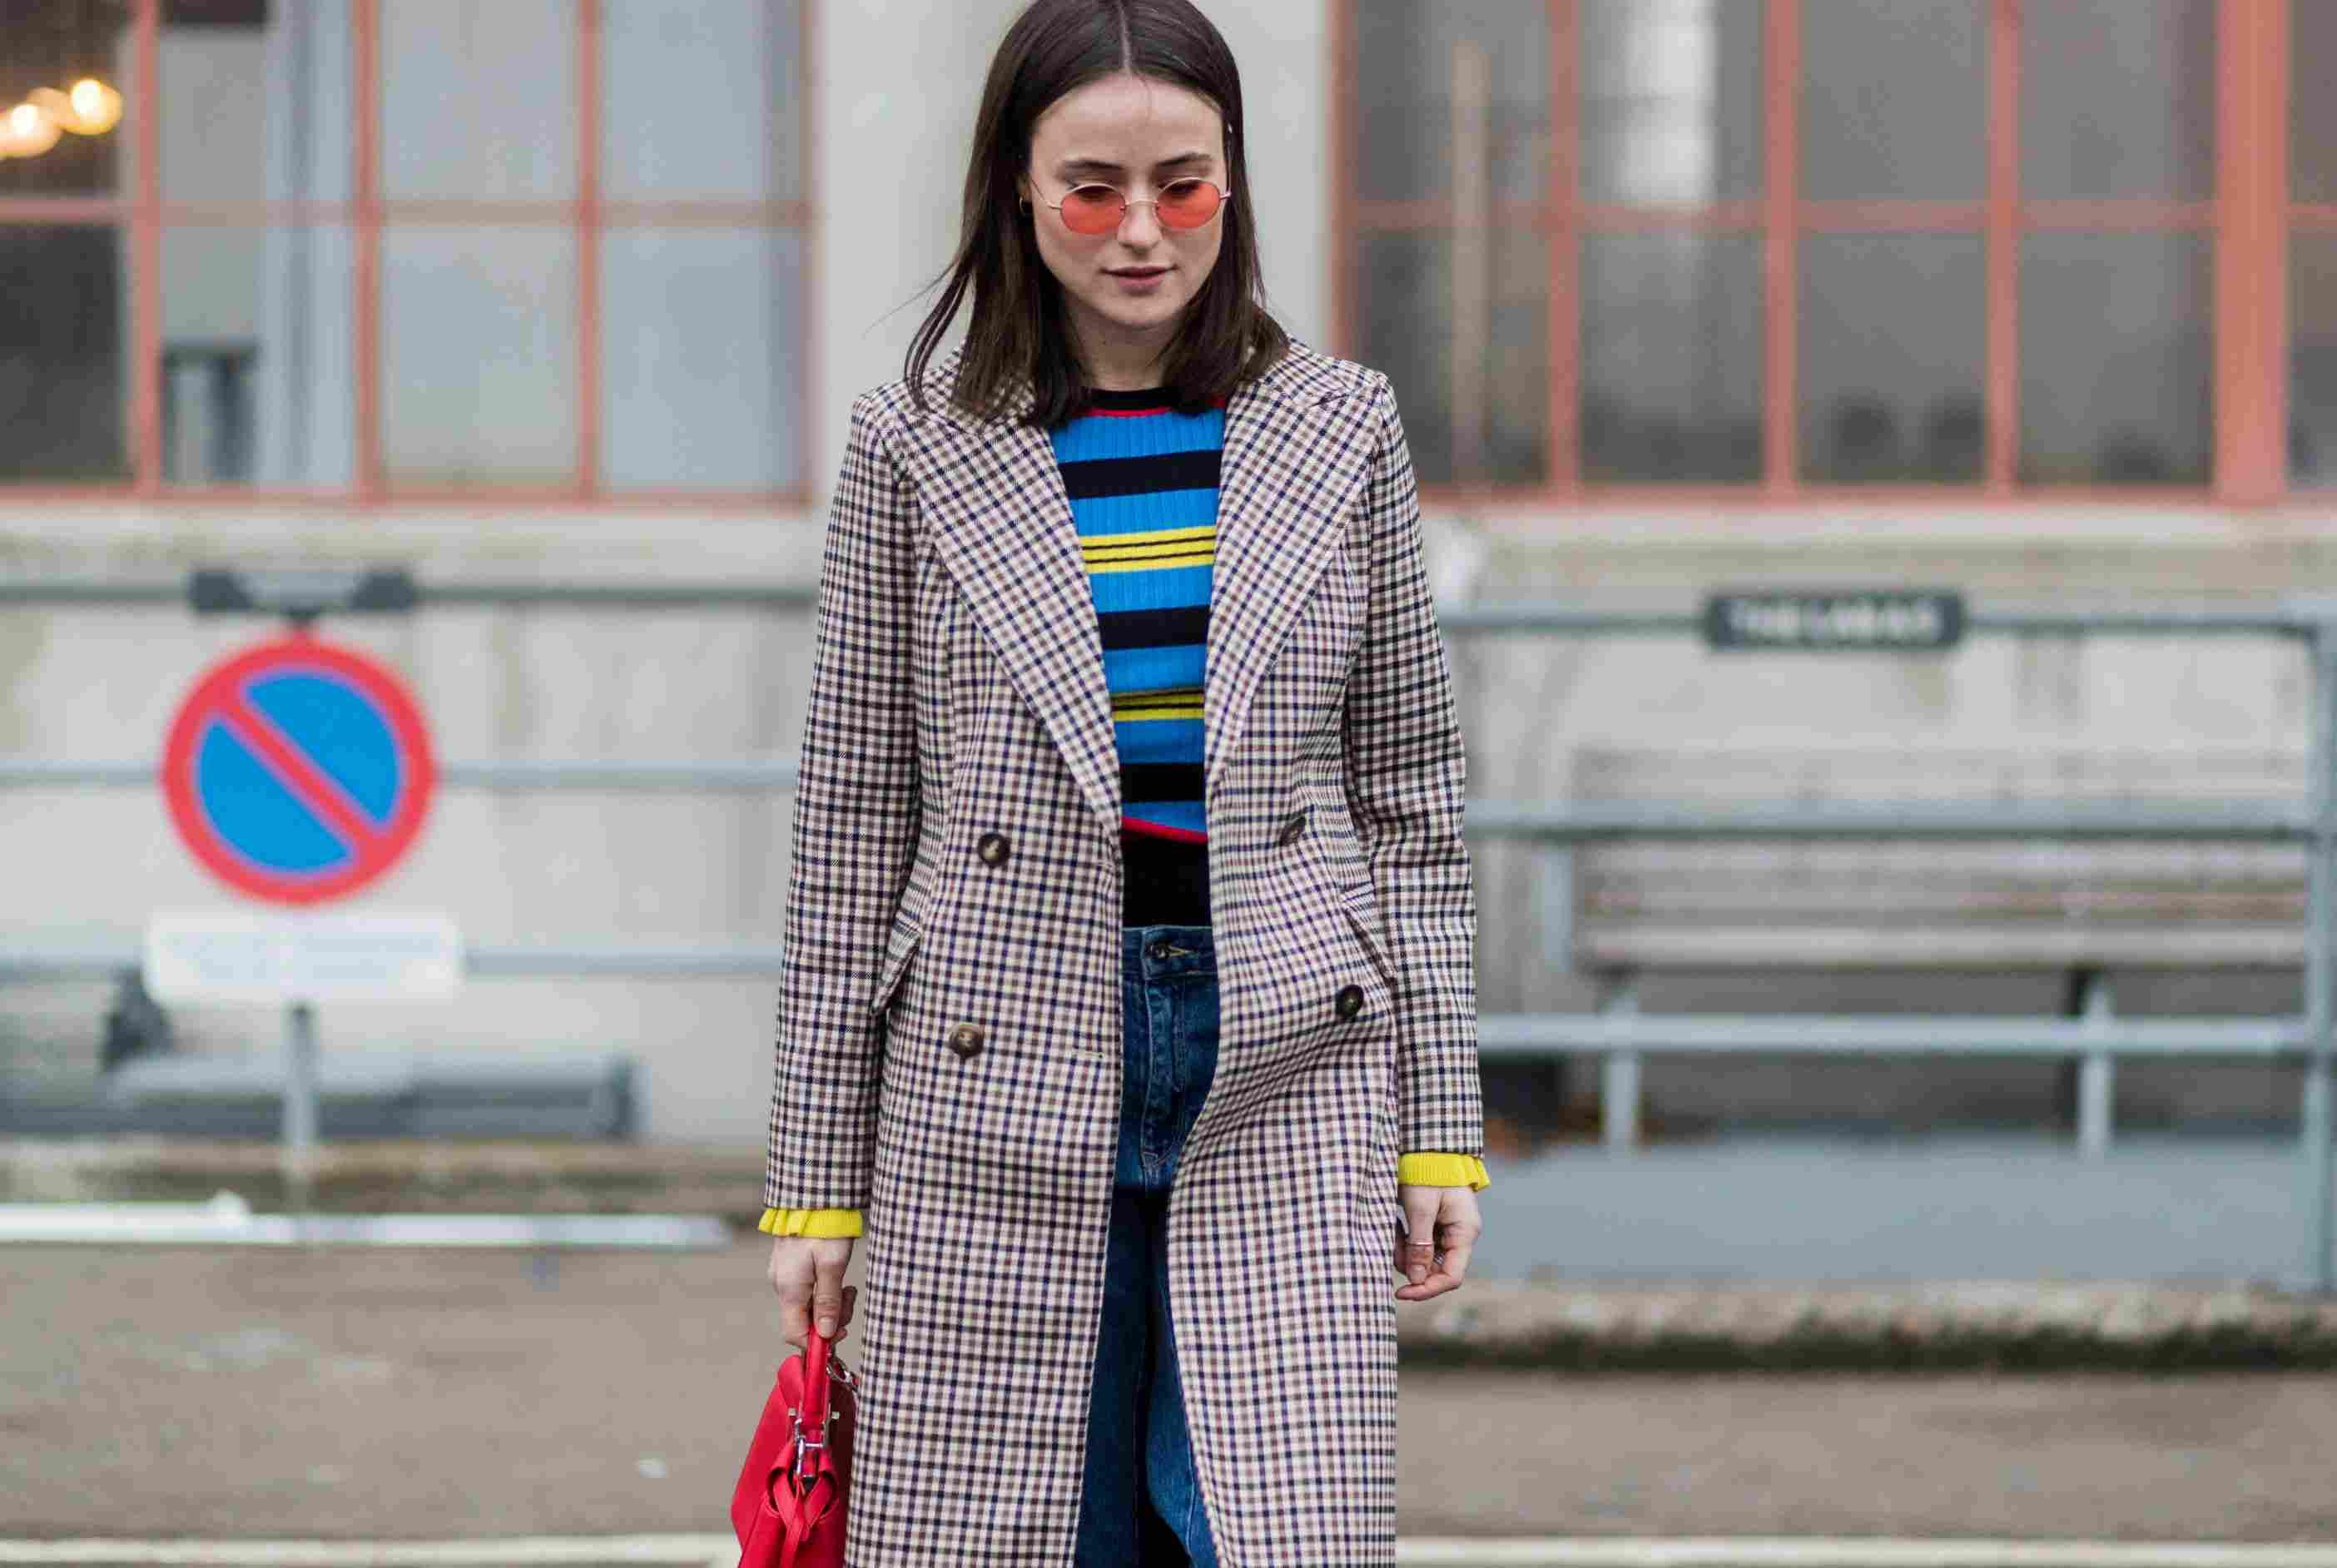 Street style denim and stripes